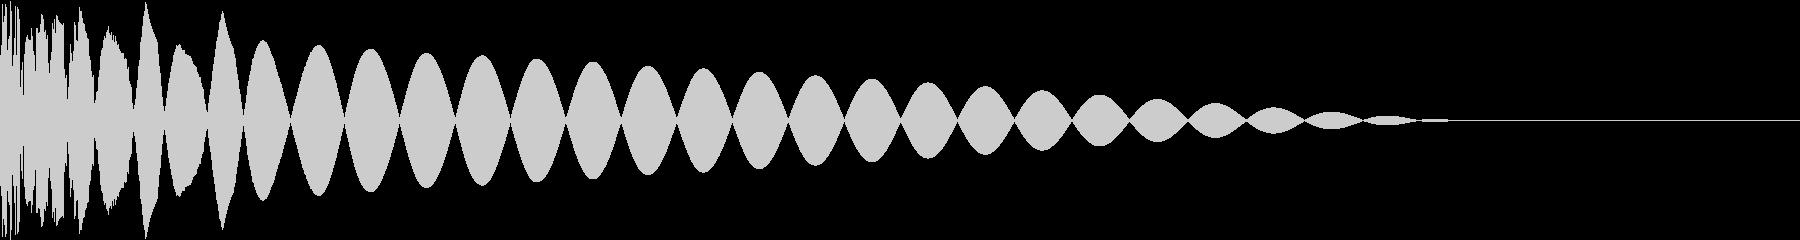 DTM Kick 77 オリジナル音源の未再生の波形